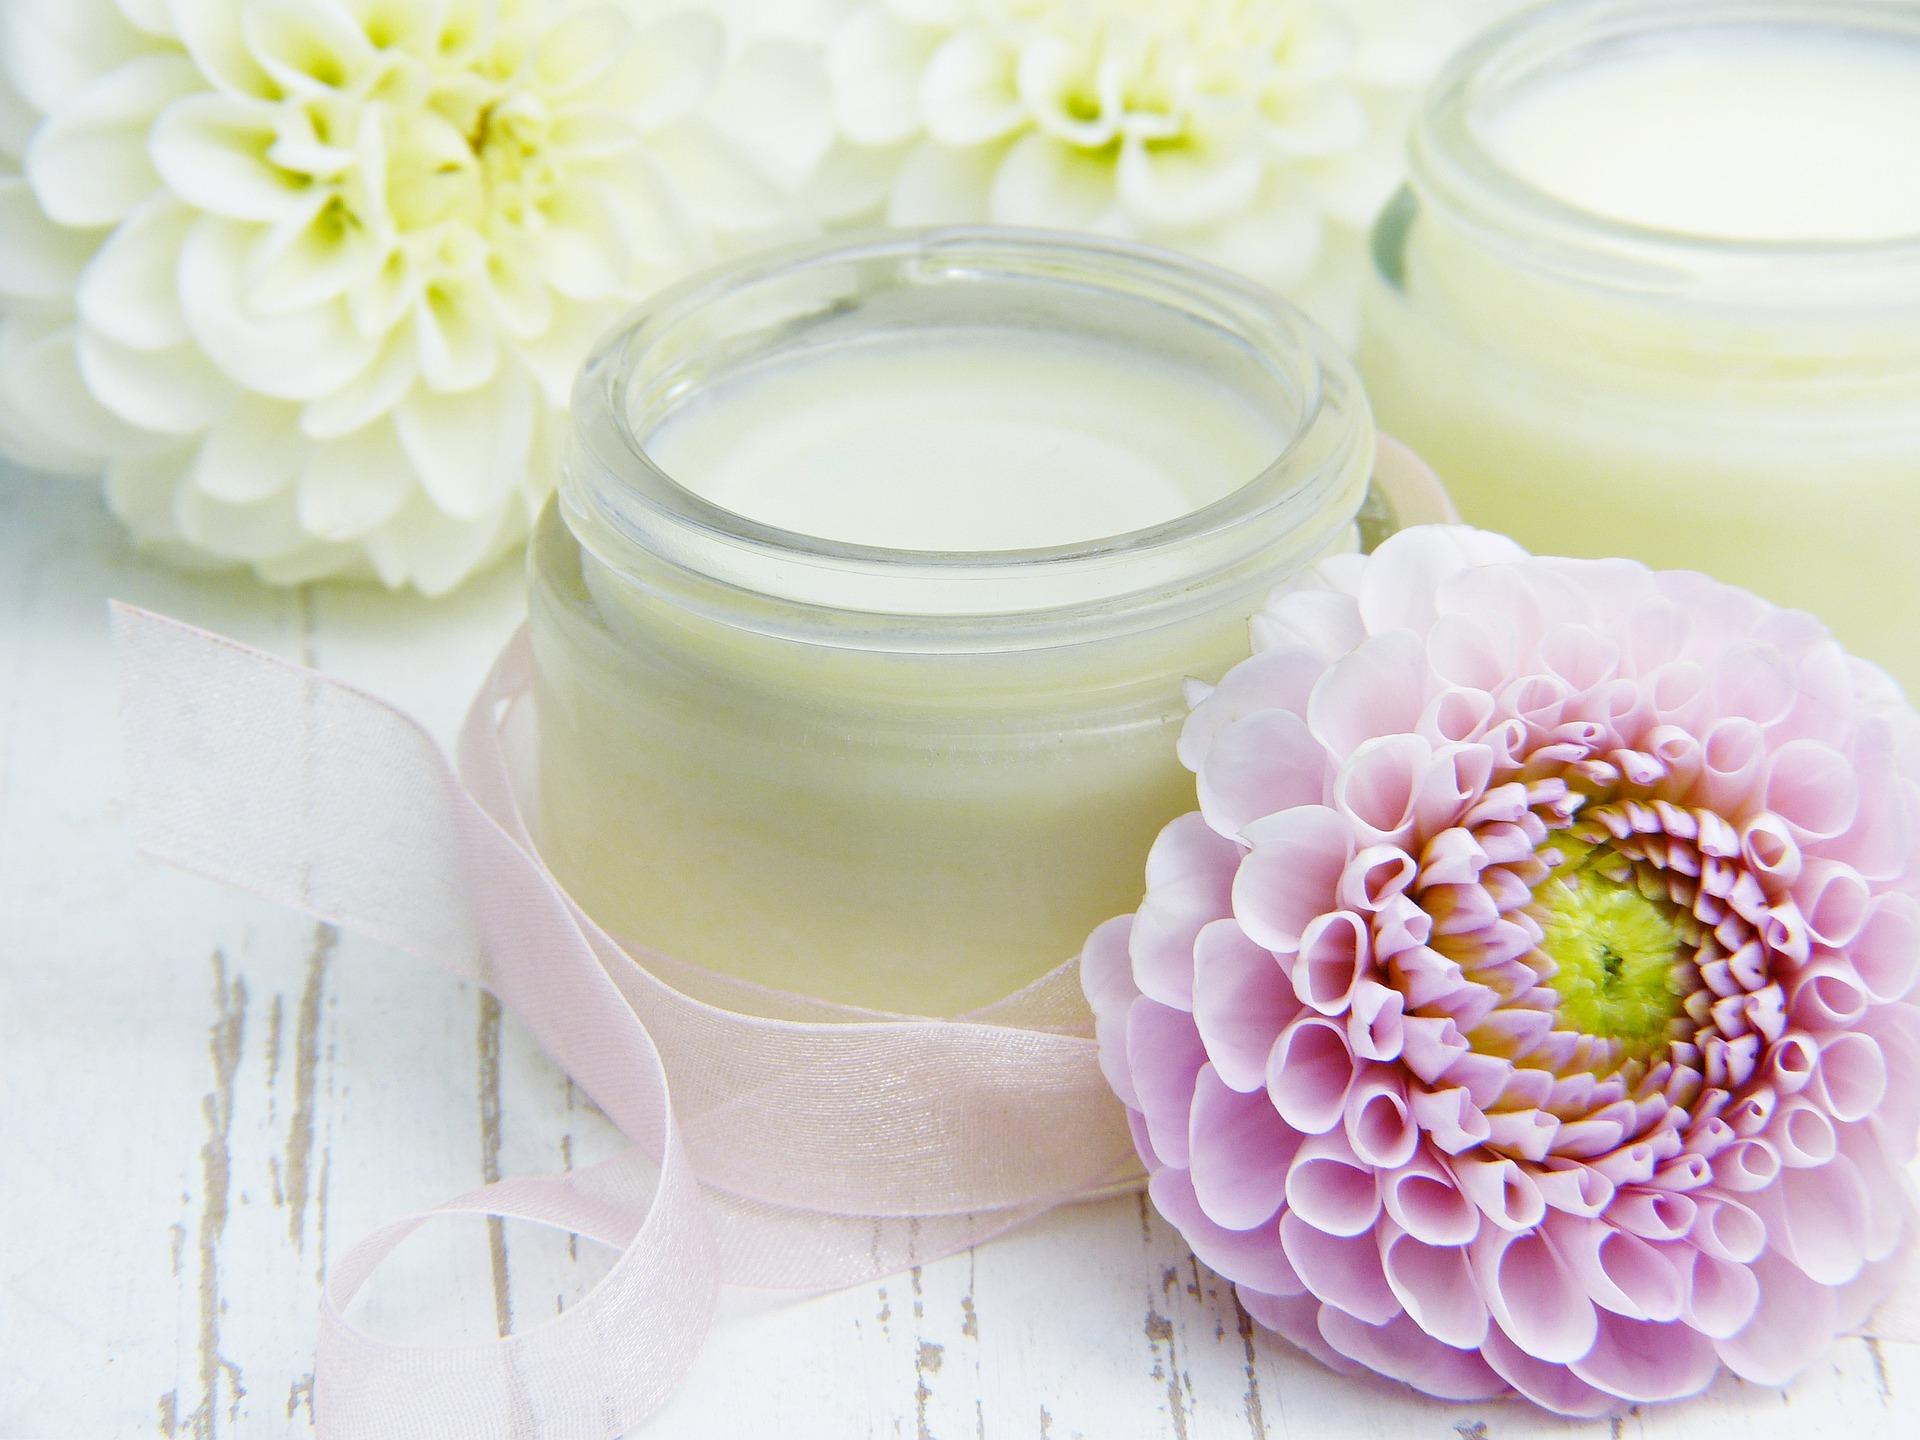 Atelier de fabrication cosmétique